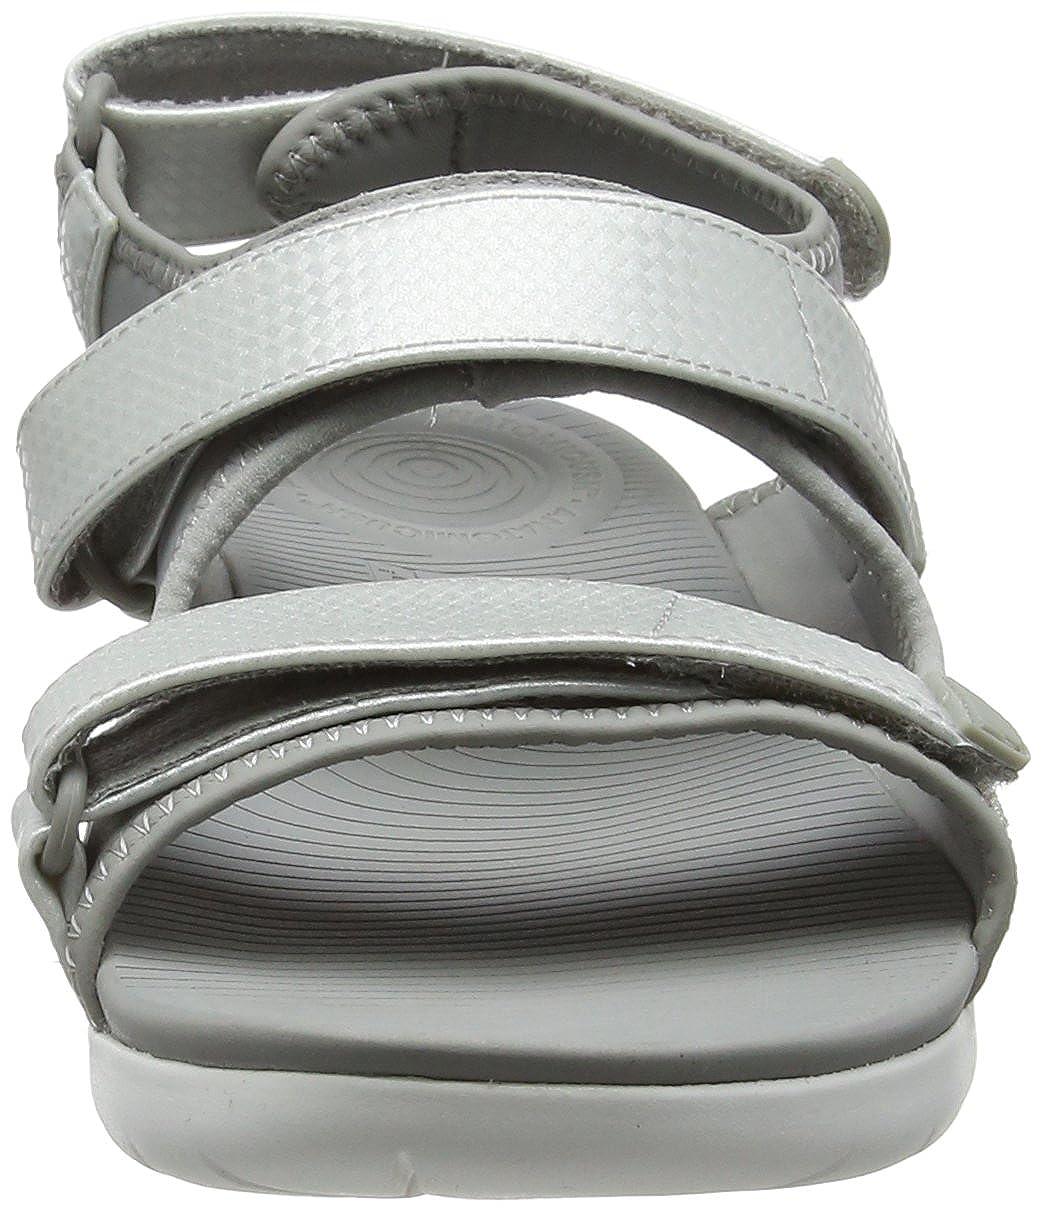 Neoflex Sandals Punta Back Aperta Fitflop Strap Sandali Donna HznRW4w7